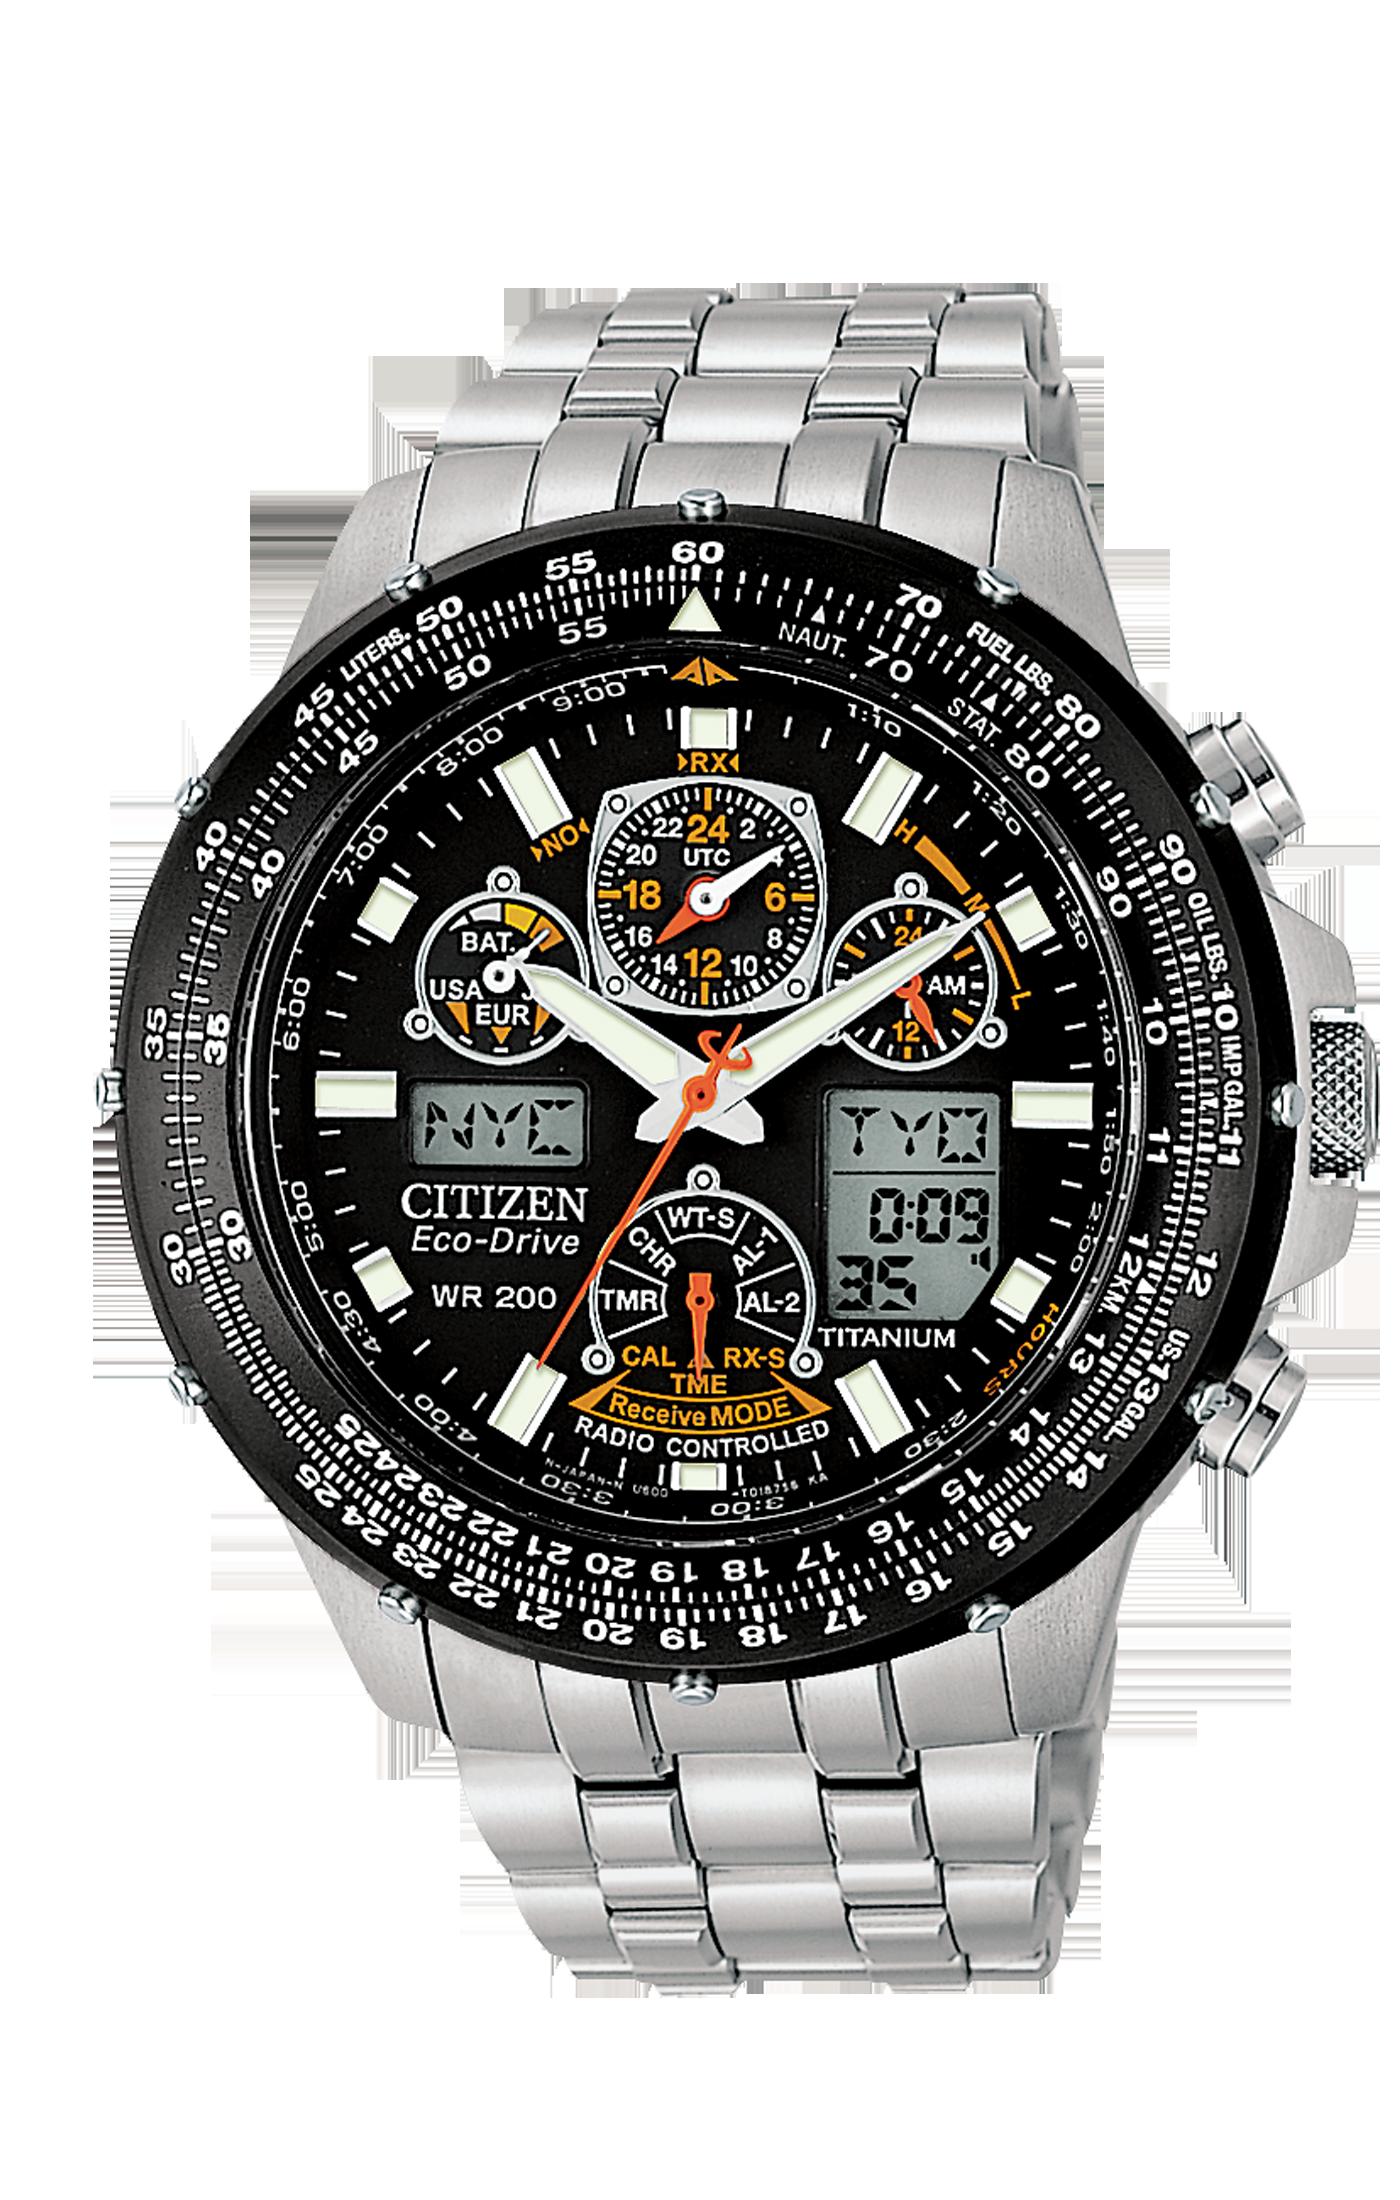 62c16f49643 Citizen Eco-Drive Skyhawk A-T JY0010-50E Atomic Timekeeping ...